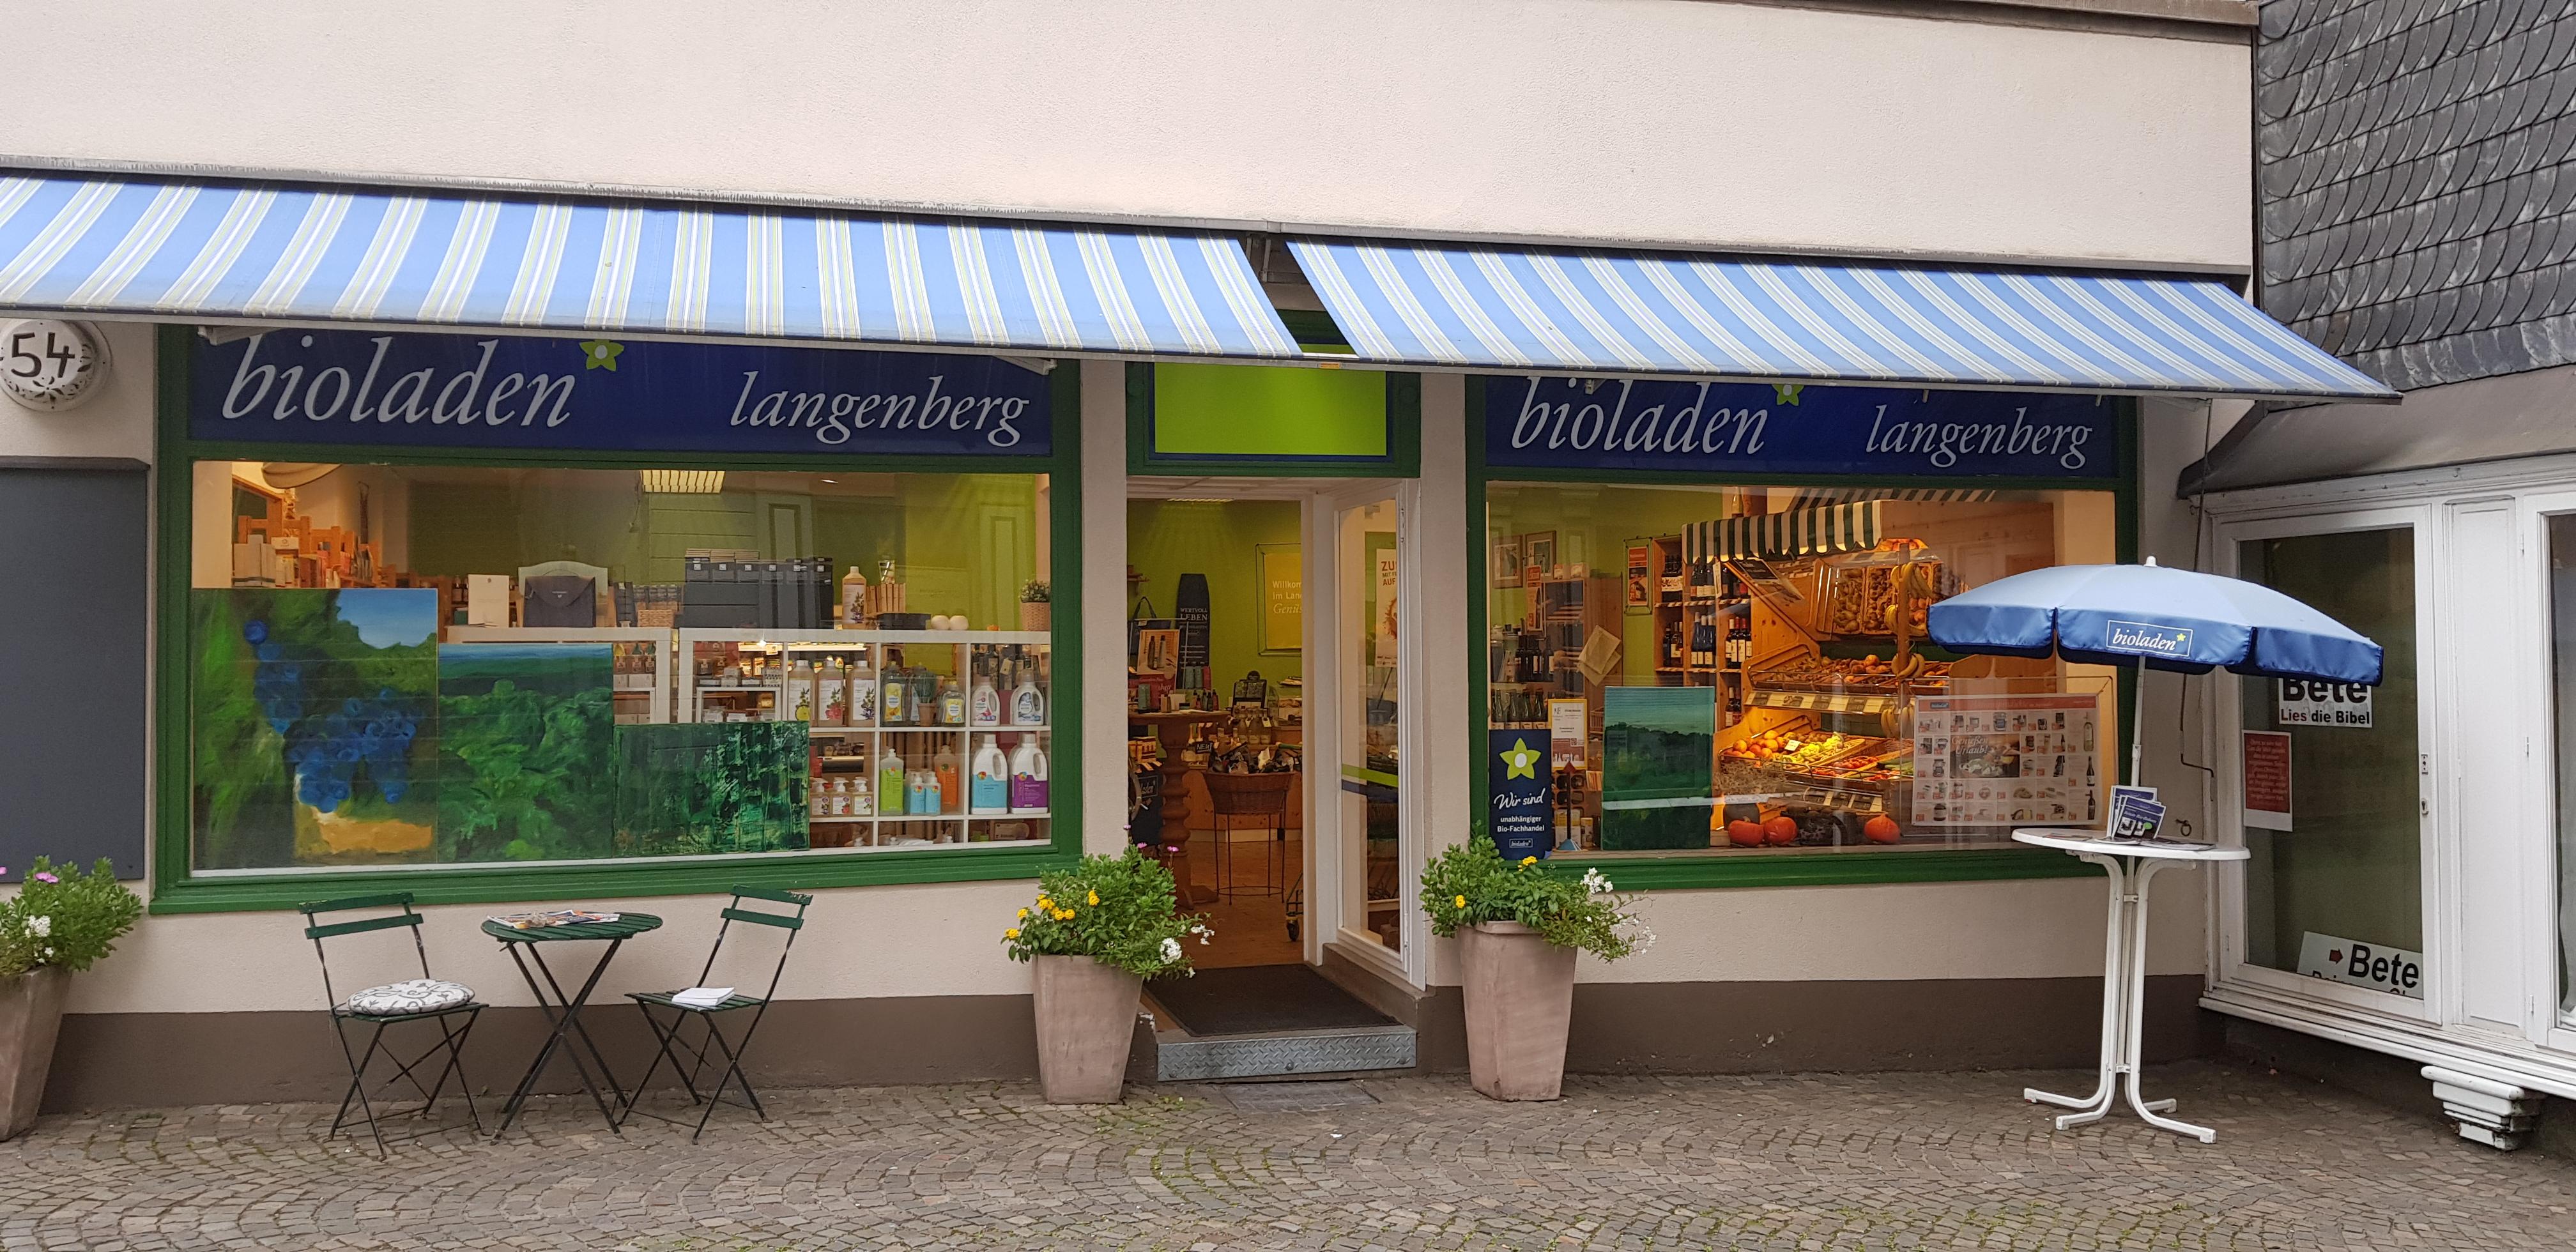 bioladen*, Langenberg